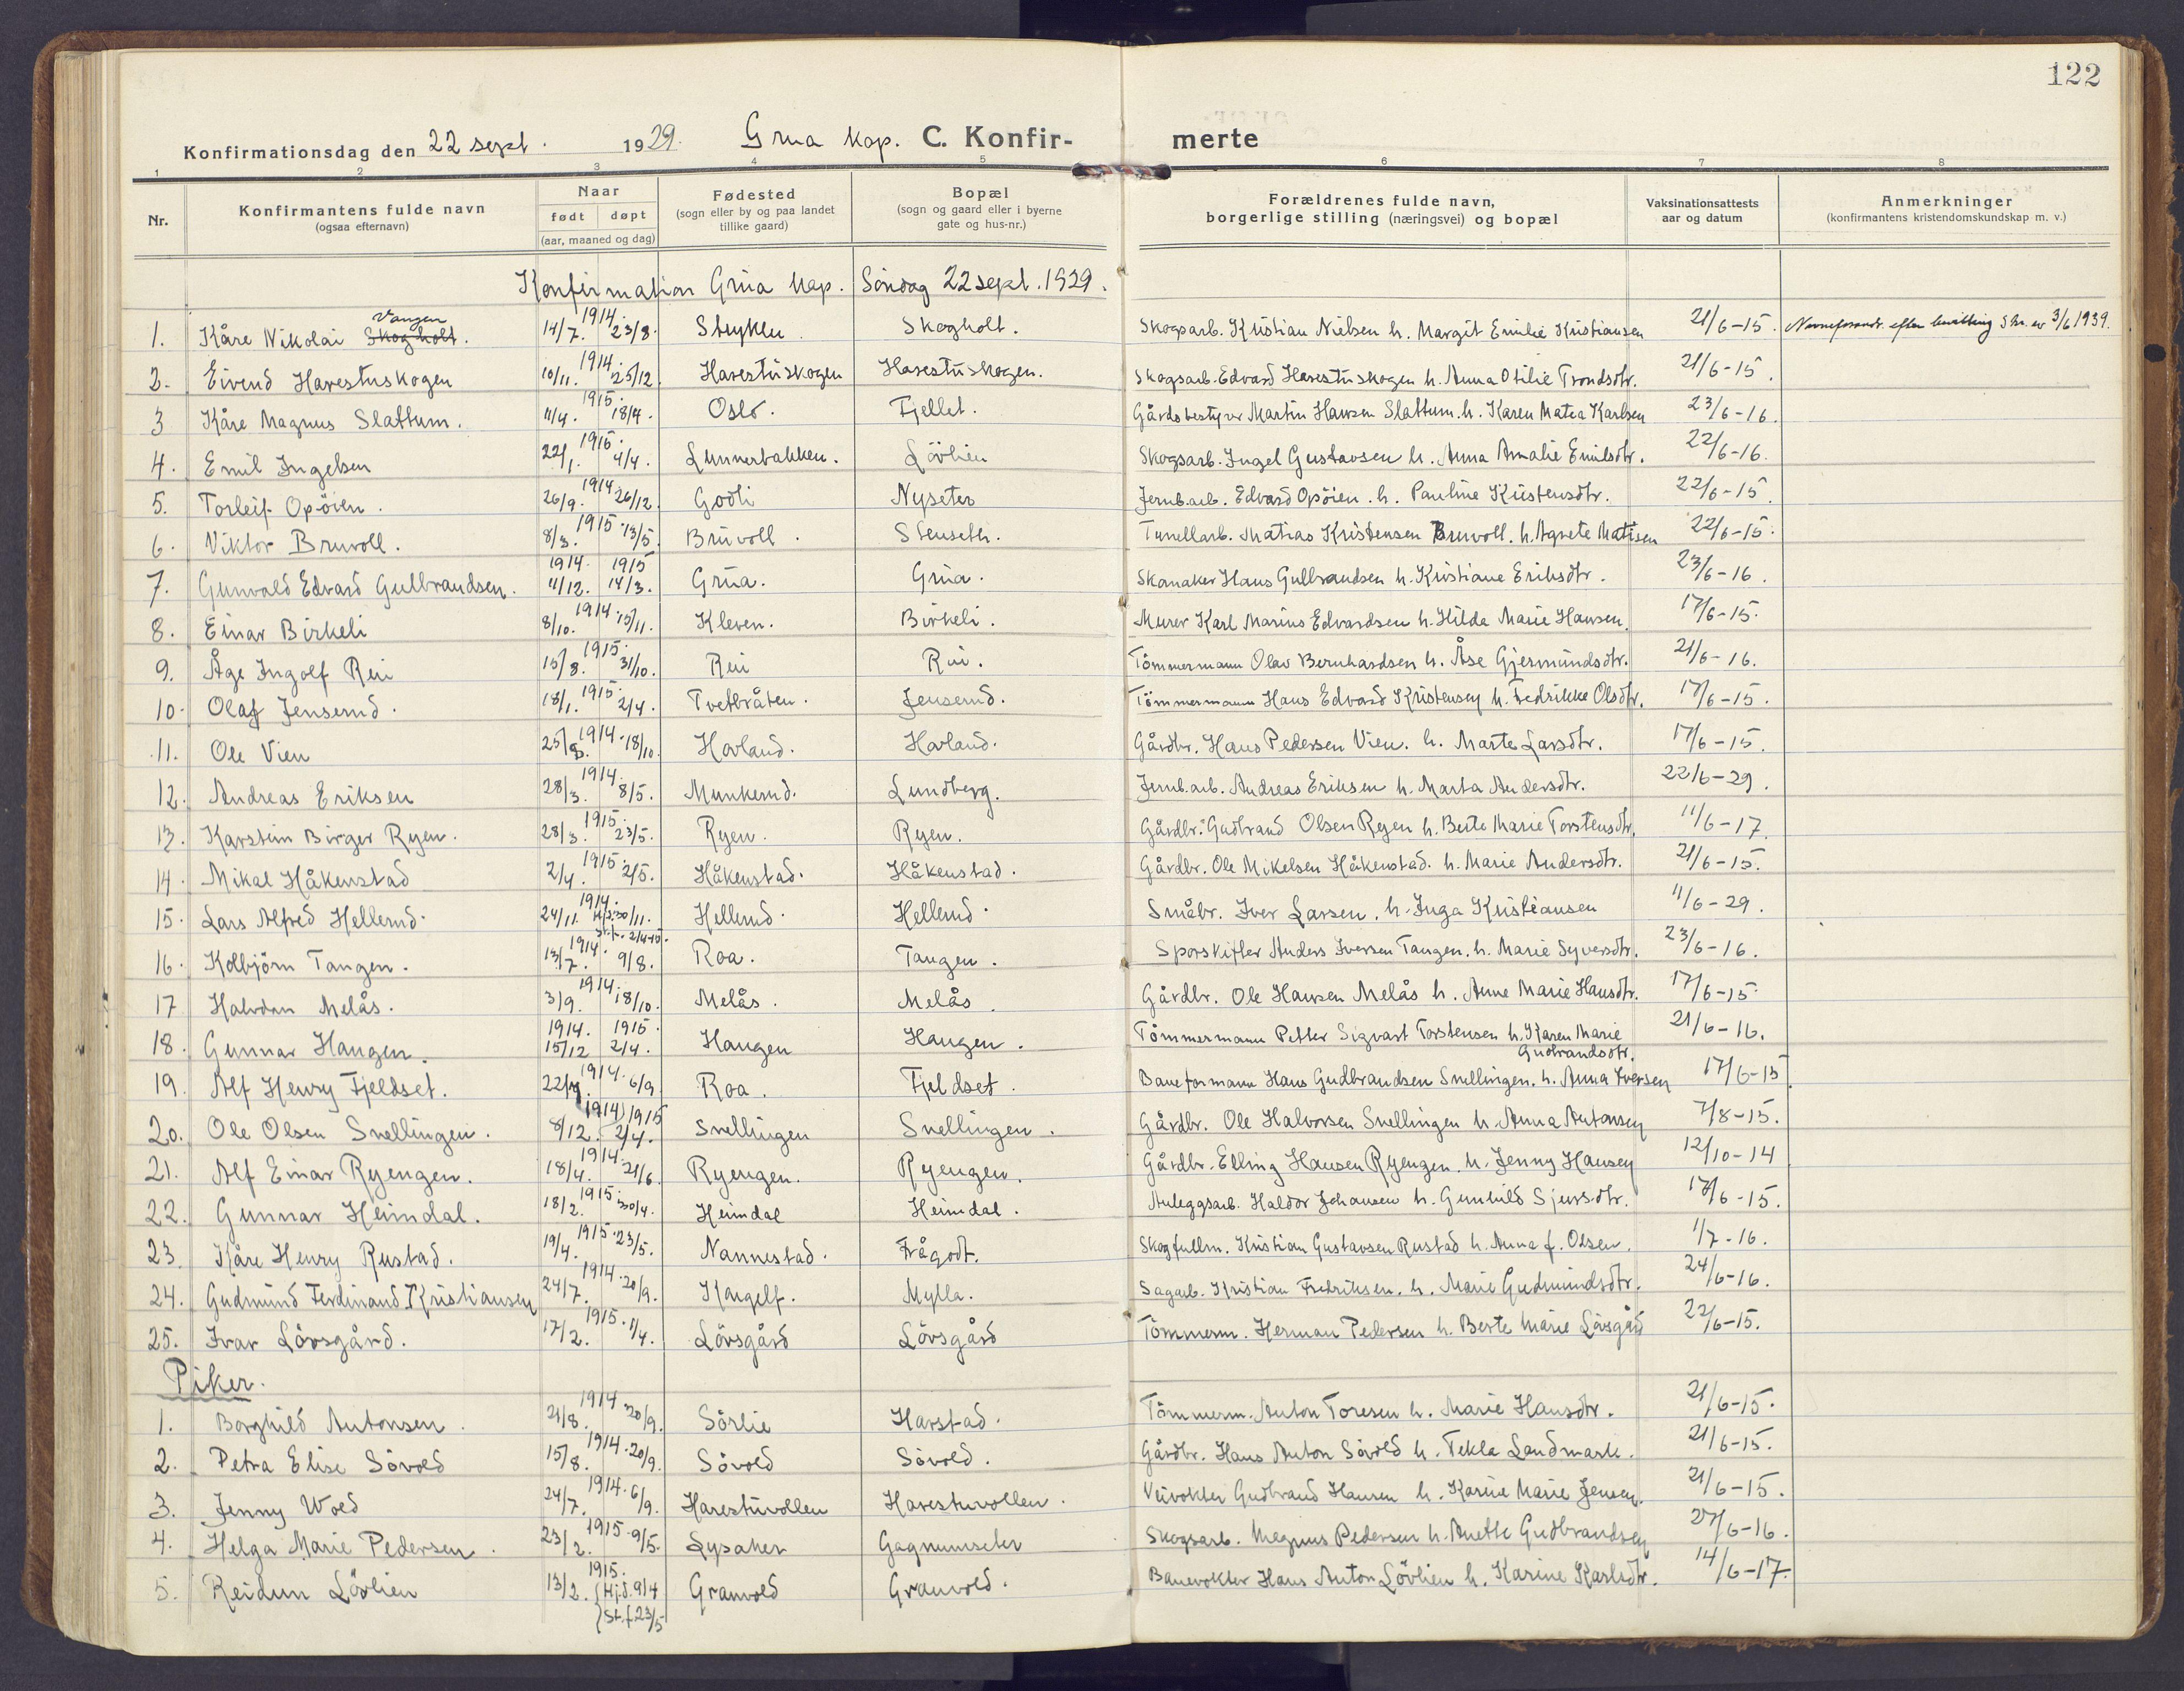 SAH, Lunner prestekontor, H/Ha/Haa/L0002: Ministerialbok nr. 2, 1922-1931, s. 122